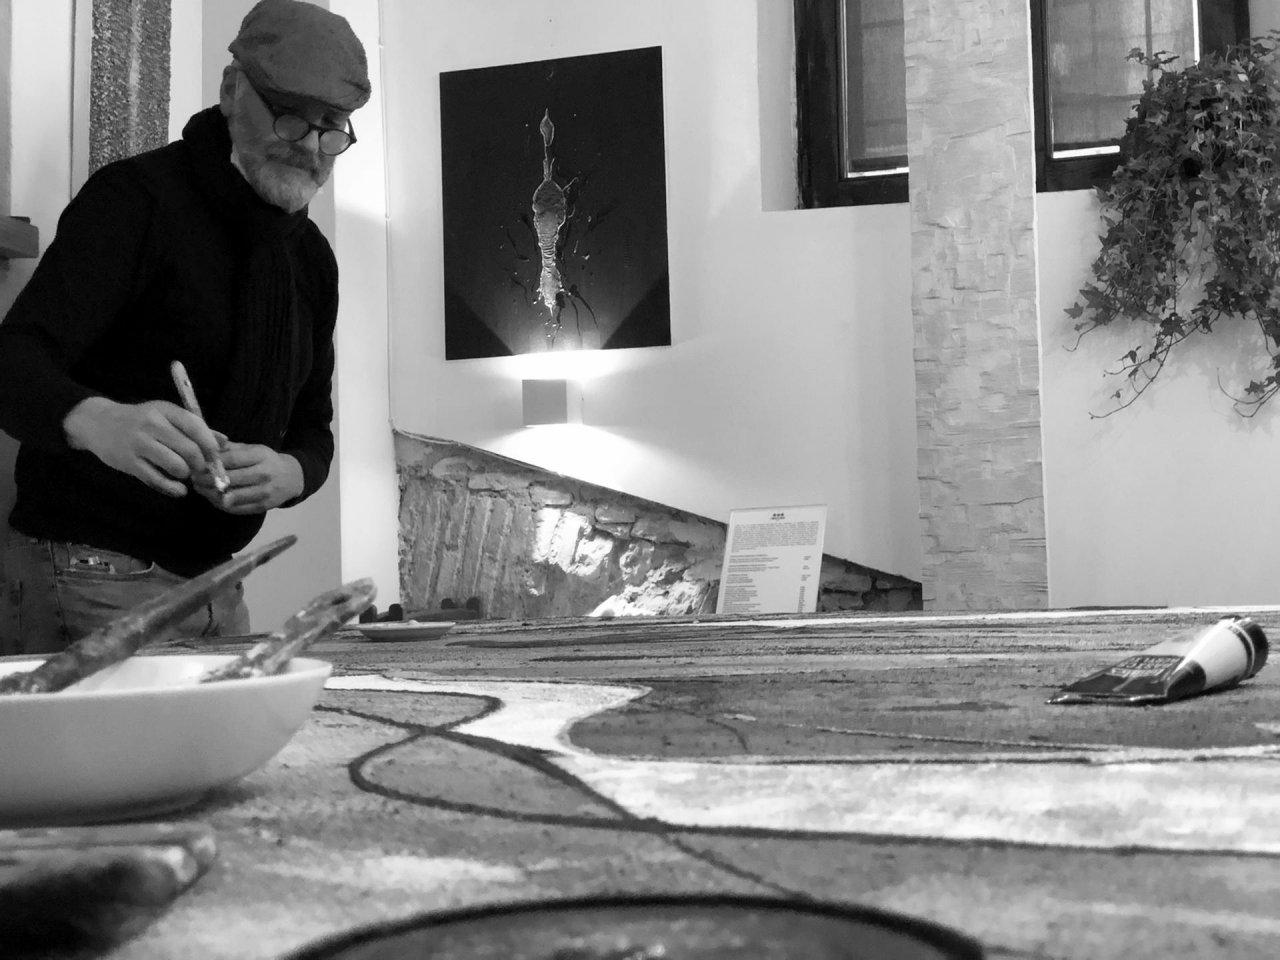 Fabrizio di nardo @ rome art week